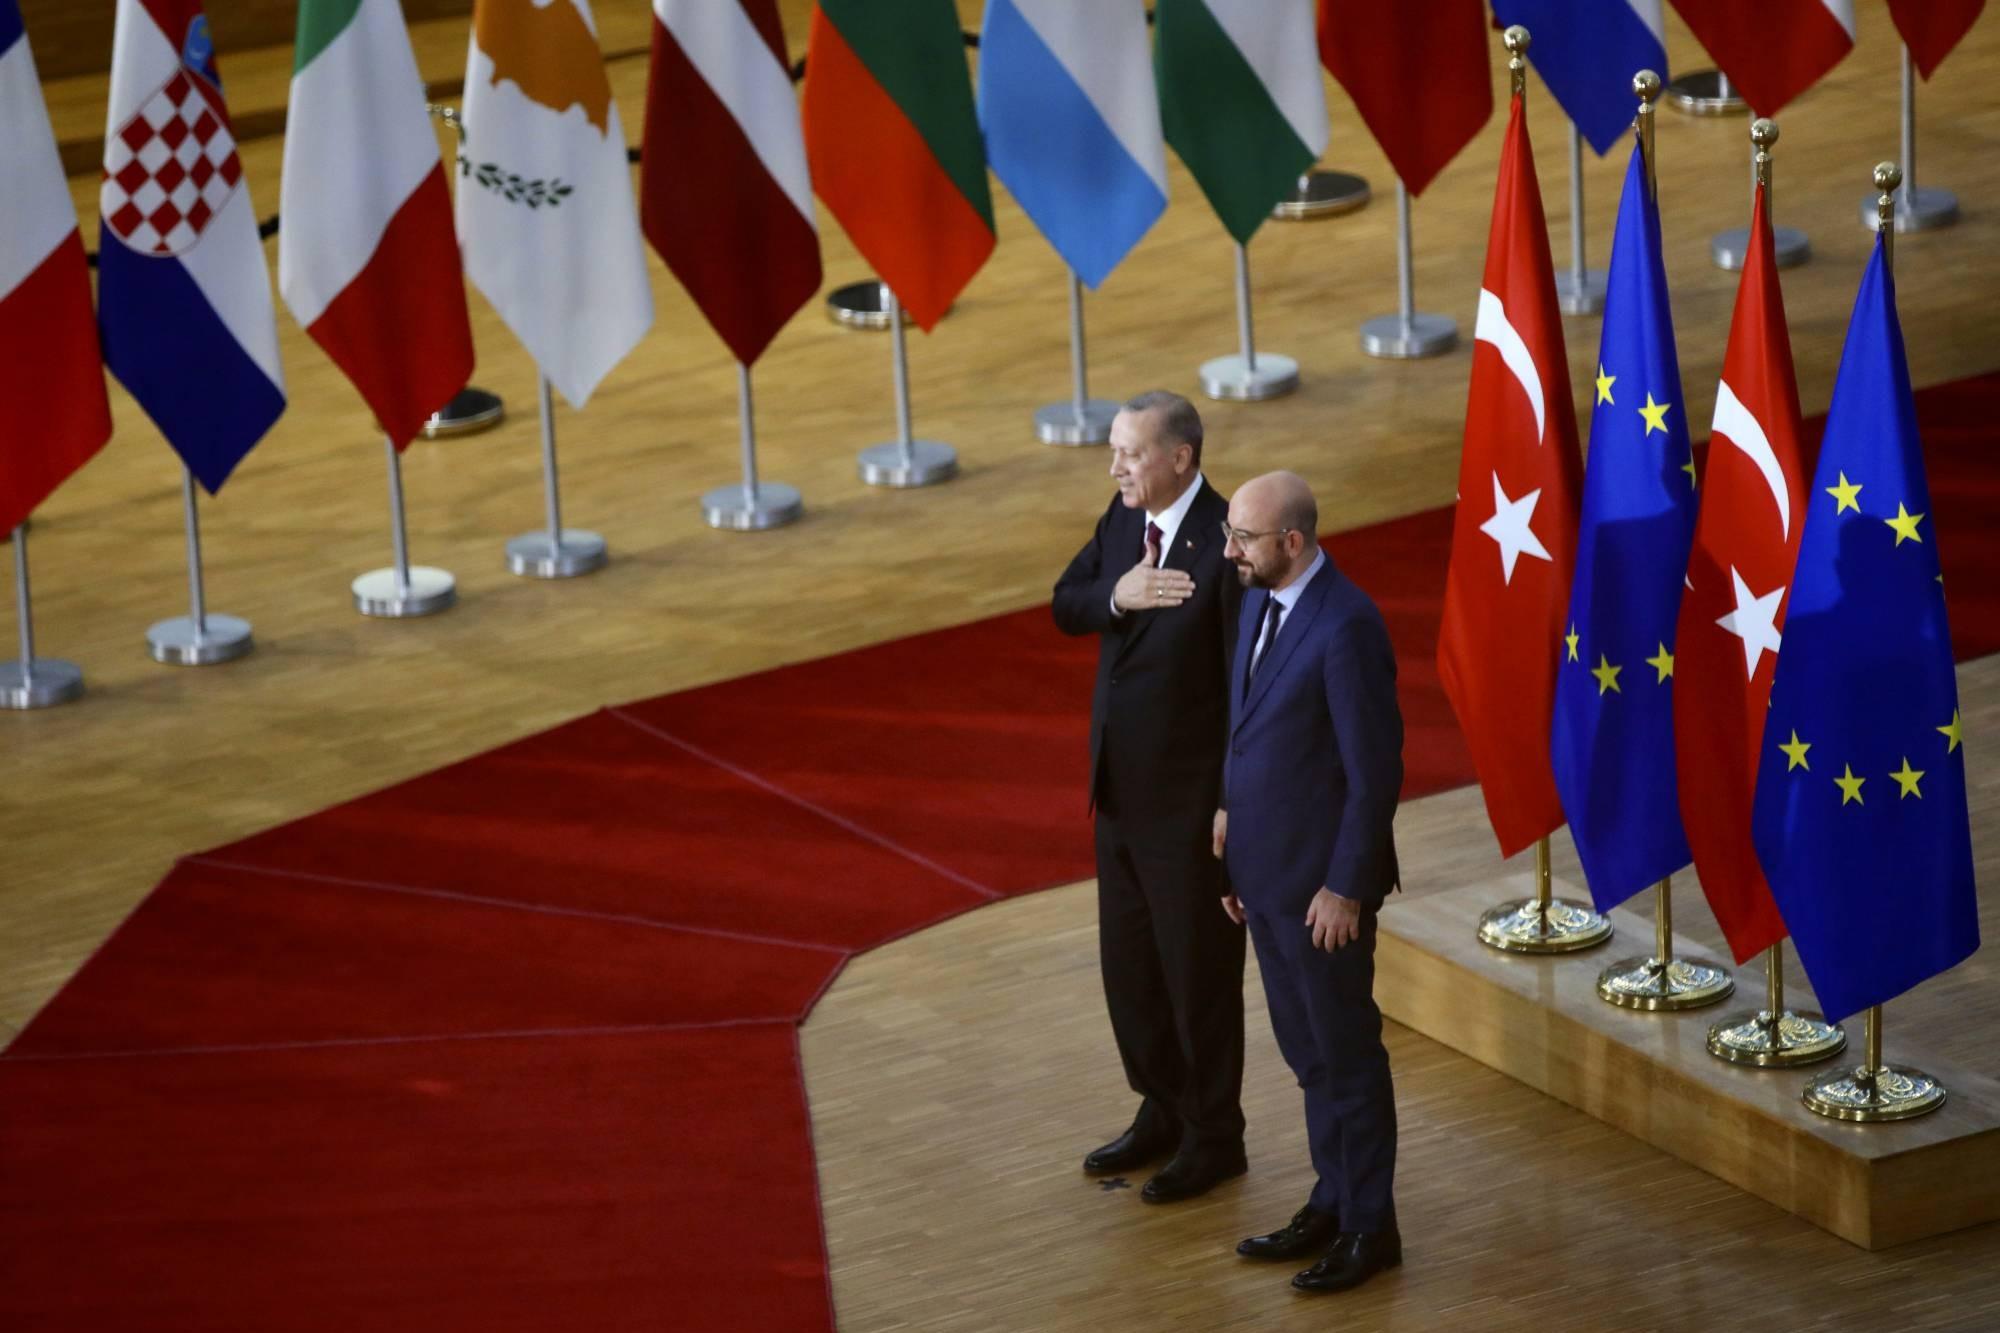 Predsednik Turske Redžep Tajip Erdogan i predsednik Evropskog saveta Šarl Mišel na sastanku u zgradi Evropskog saveta u Briselu, 09. mart 2020. (Foto: AP Photo/Olivier Matthys)